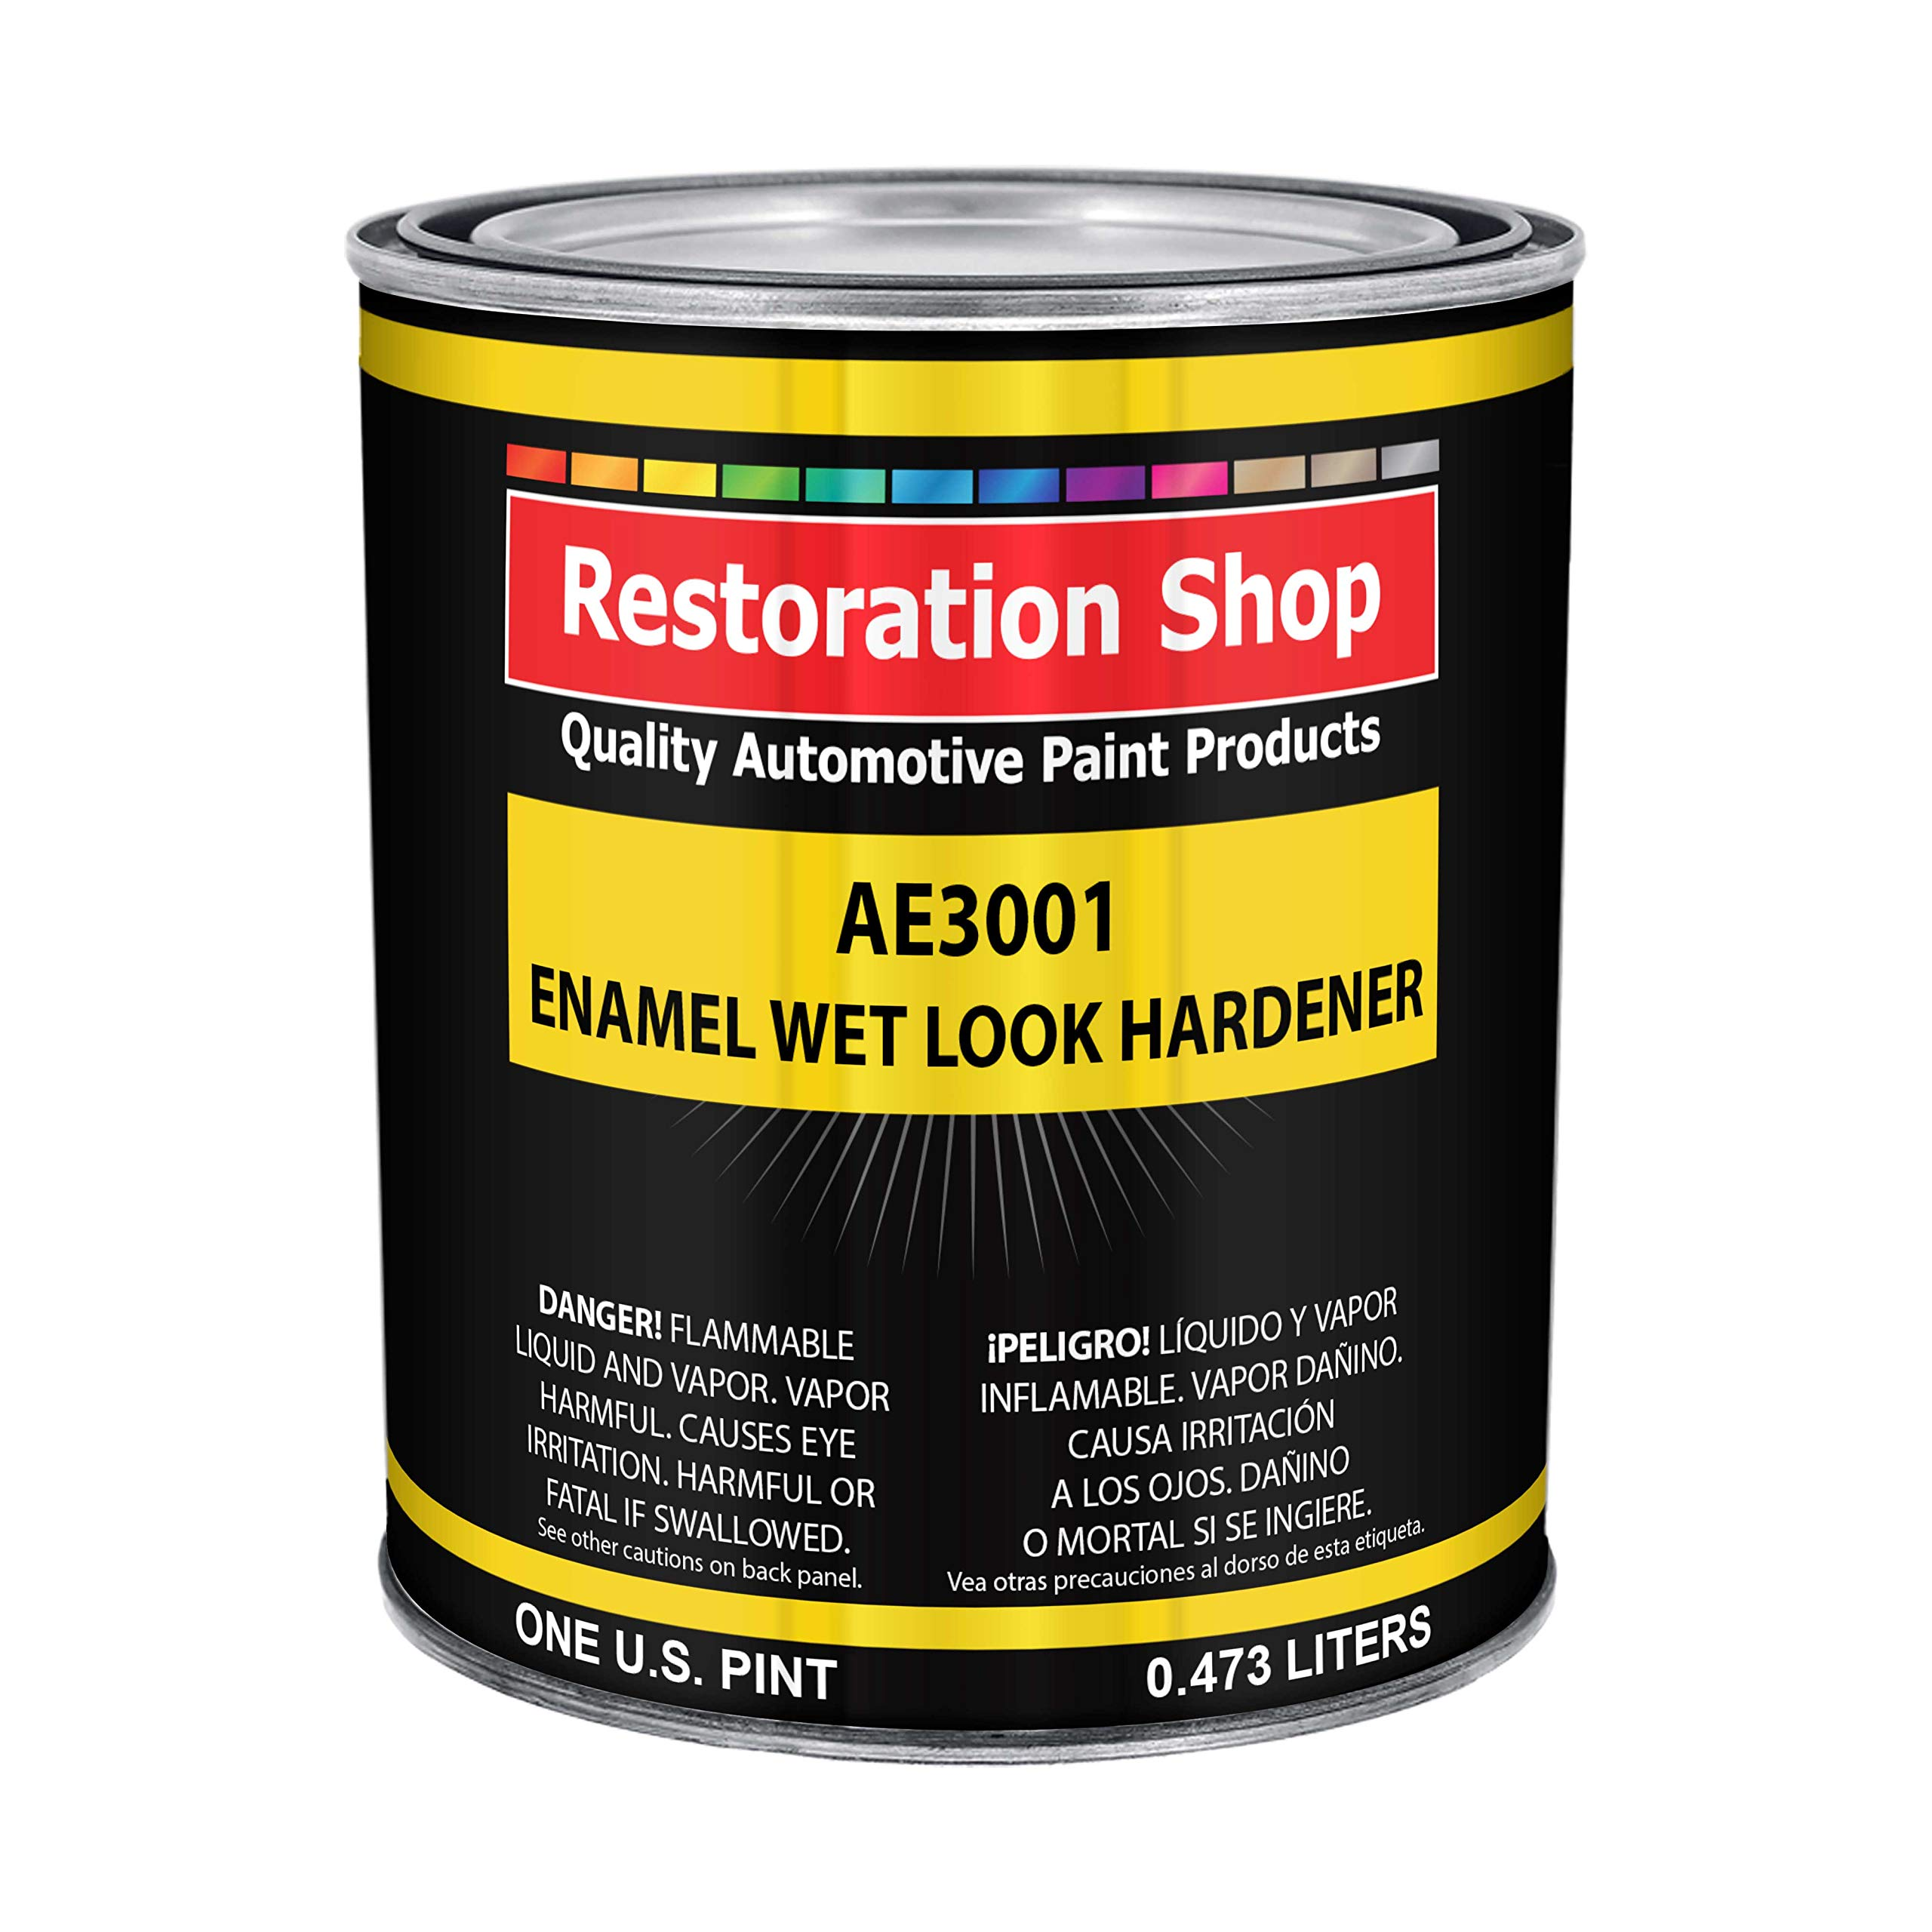 Restoration Shop Acrylic Enamel Hardener Pint Can